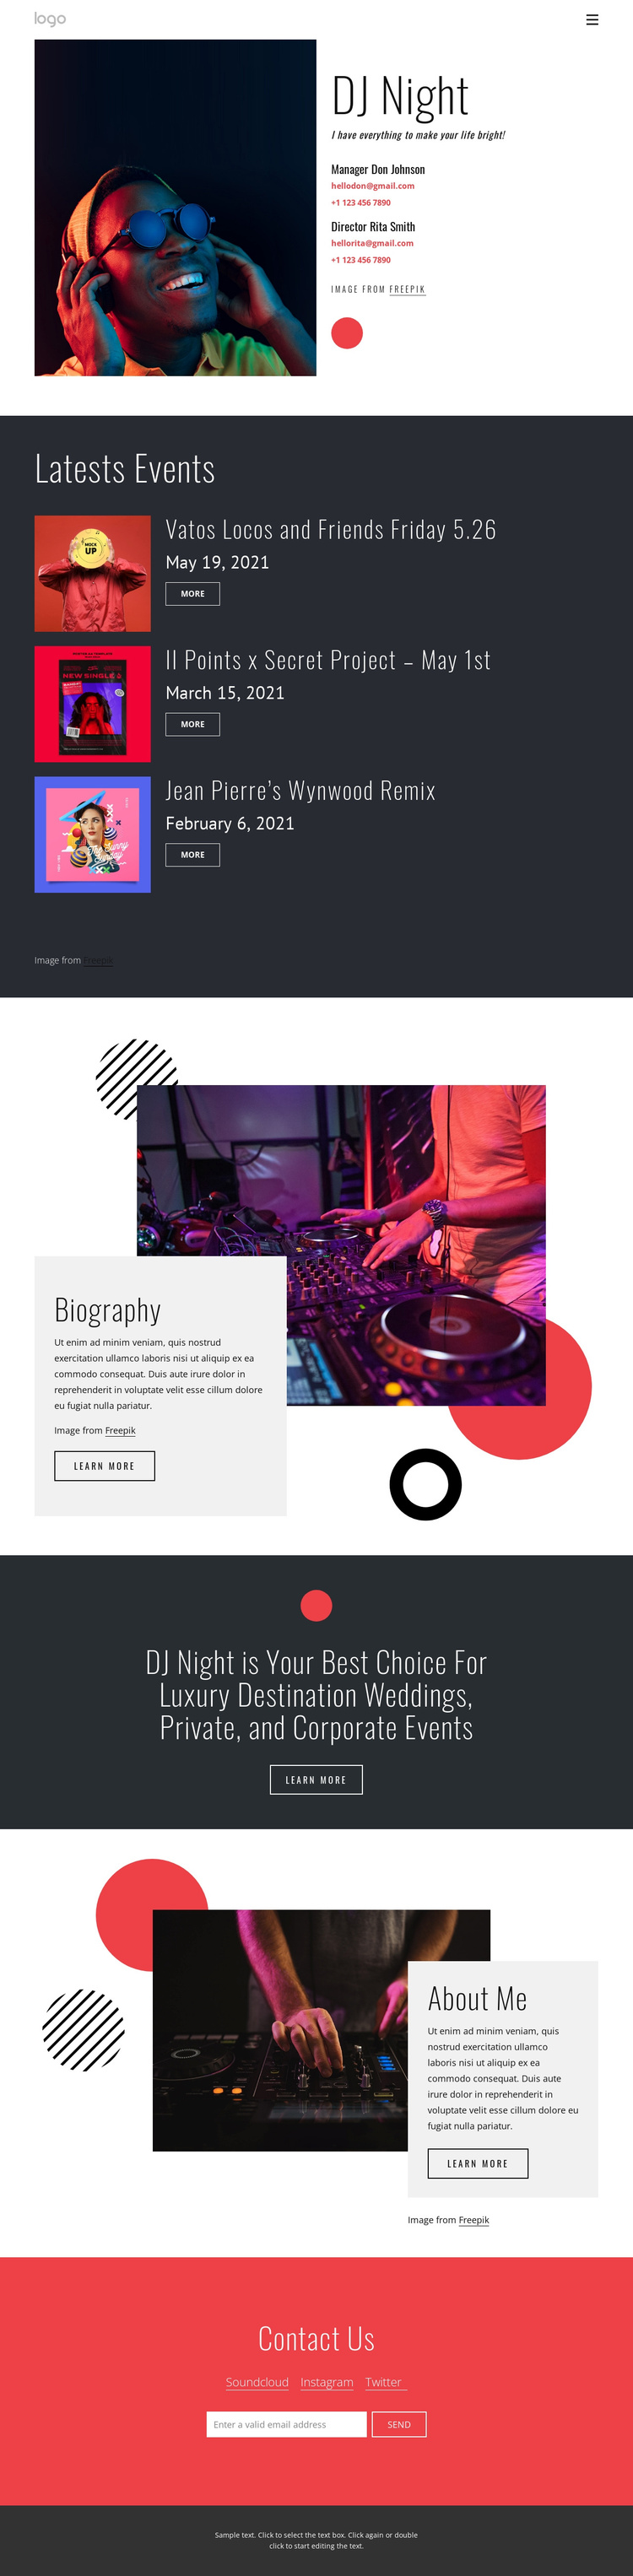 Dj night website Joomla Template